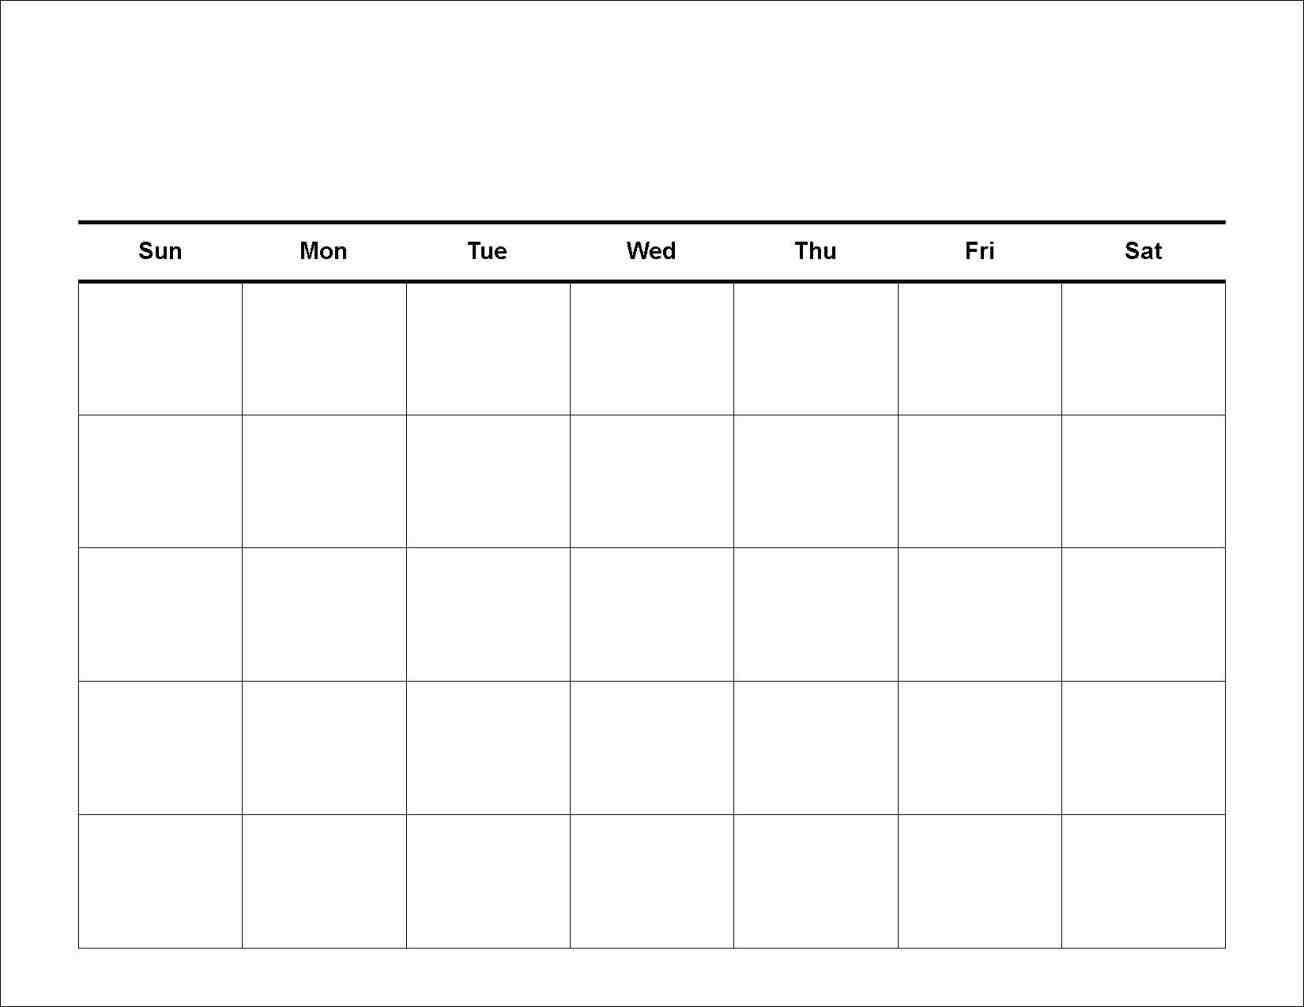 Free 7 Day Blank Calendar | Igotlockedout with 7 Day Week Blank Calendar